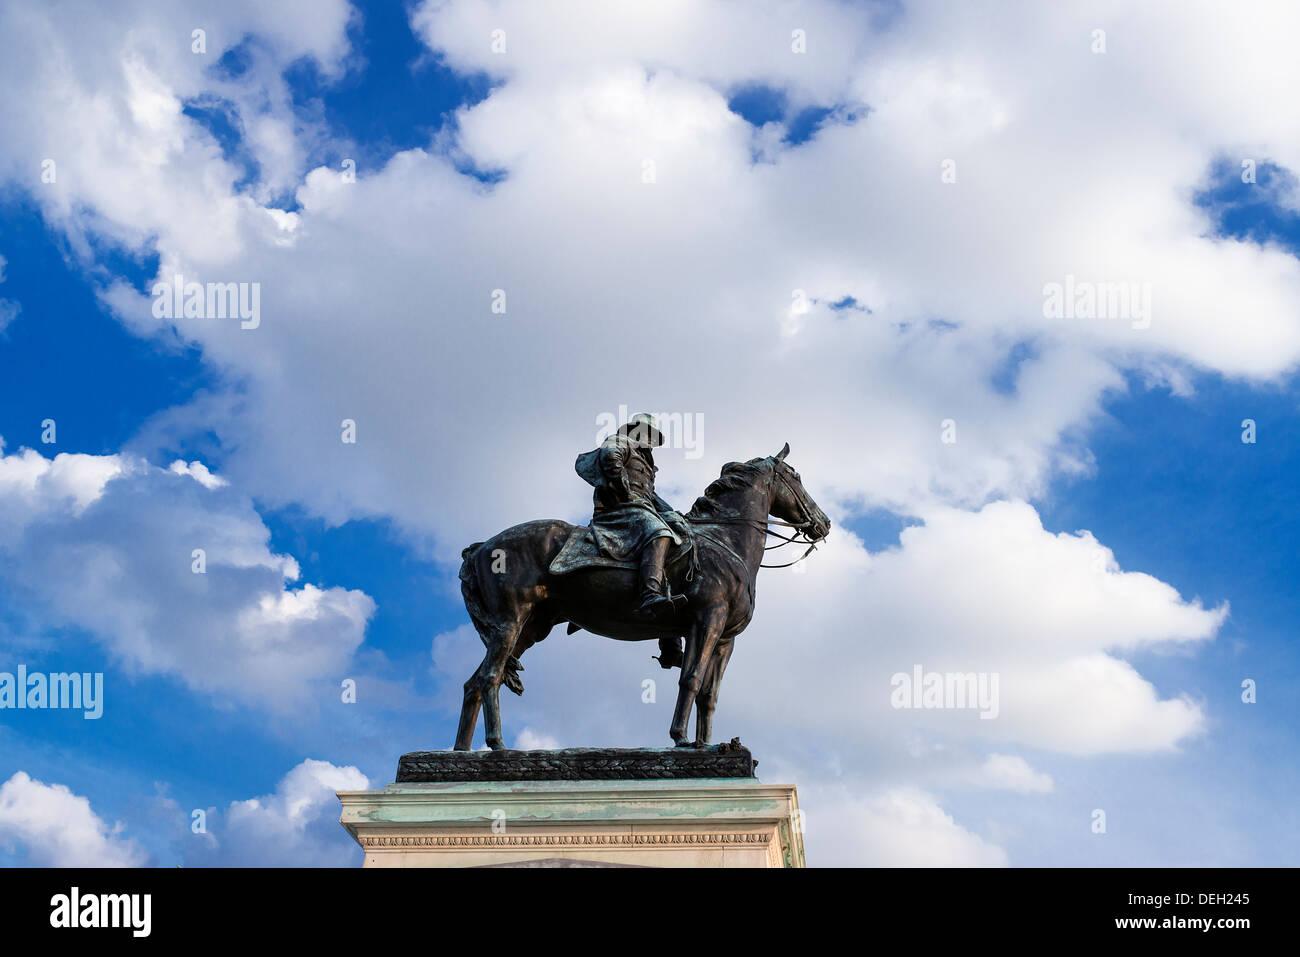 Ulysses S. Grant Memorial, Washington D.C., USA - Stock Image